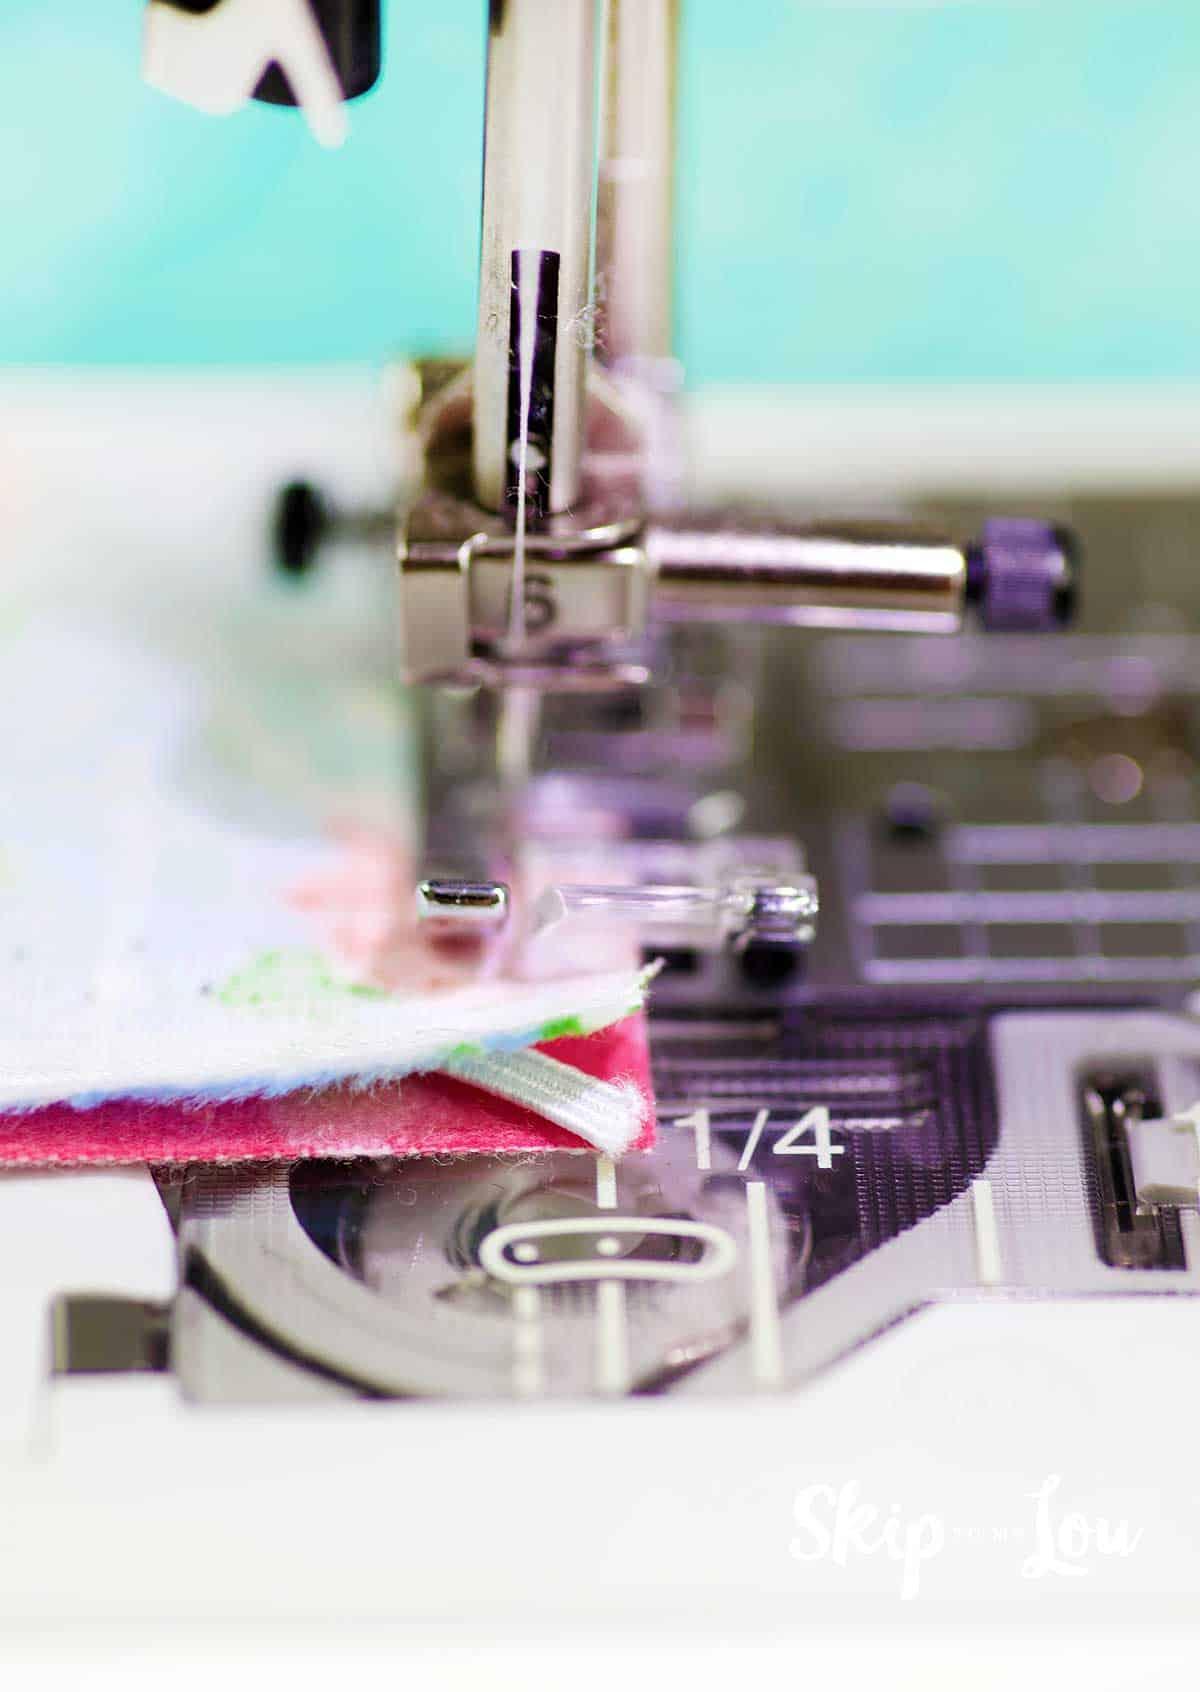 sewing machine stitching elastic at corner